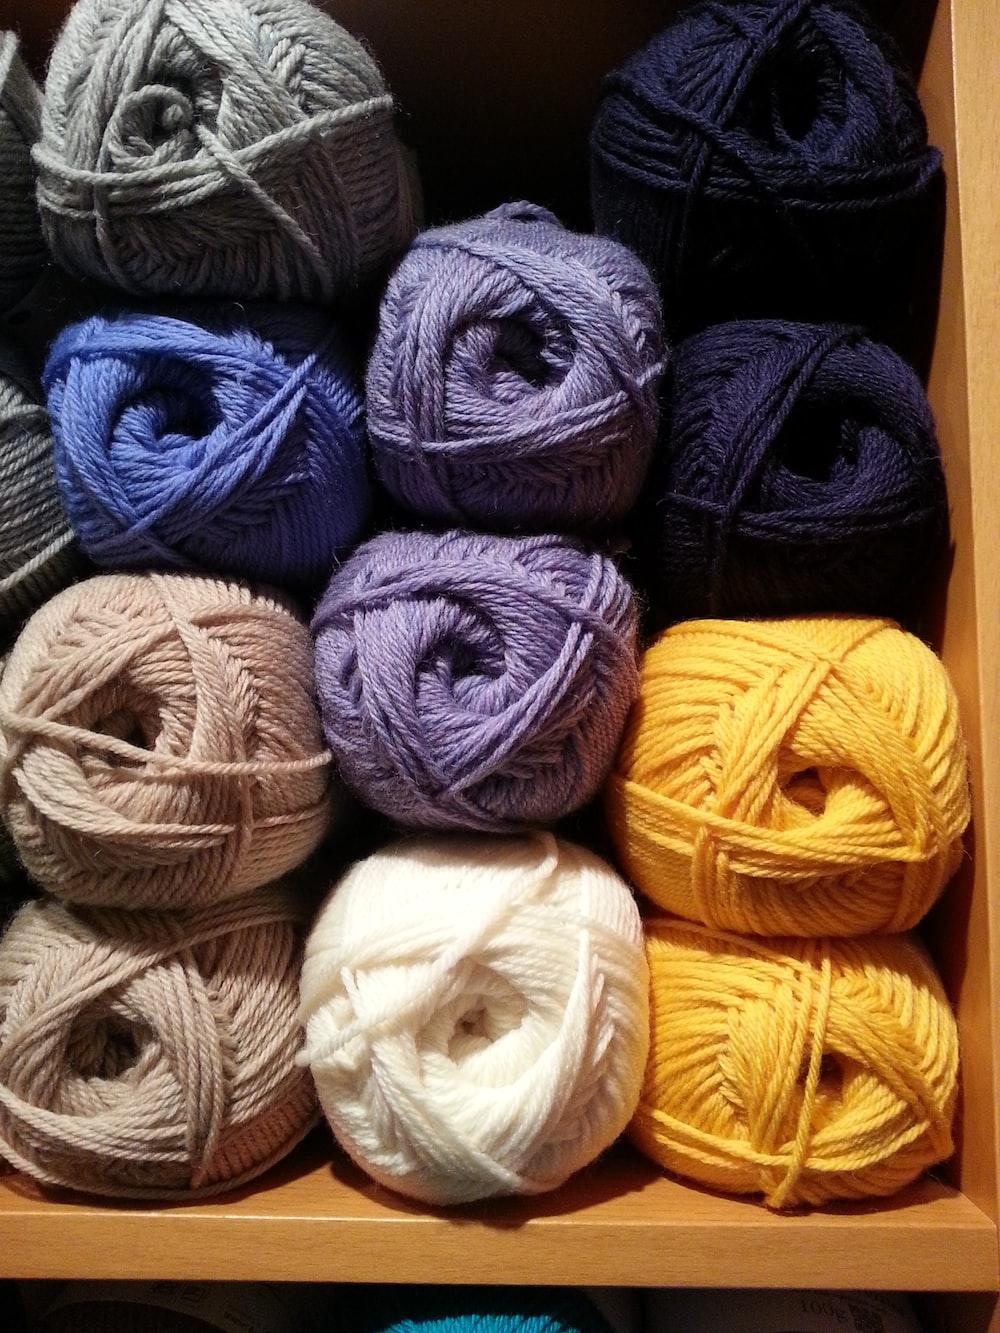 assorted-color yarn rolls piled in shelf